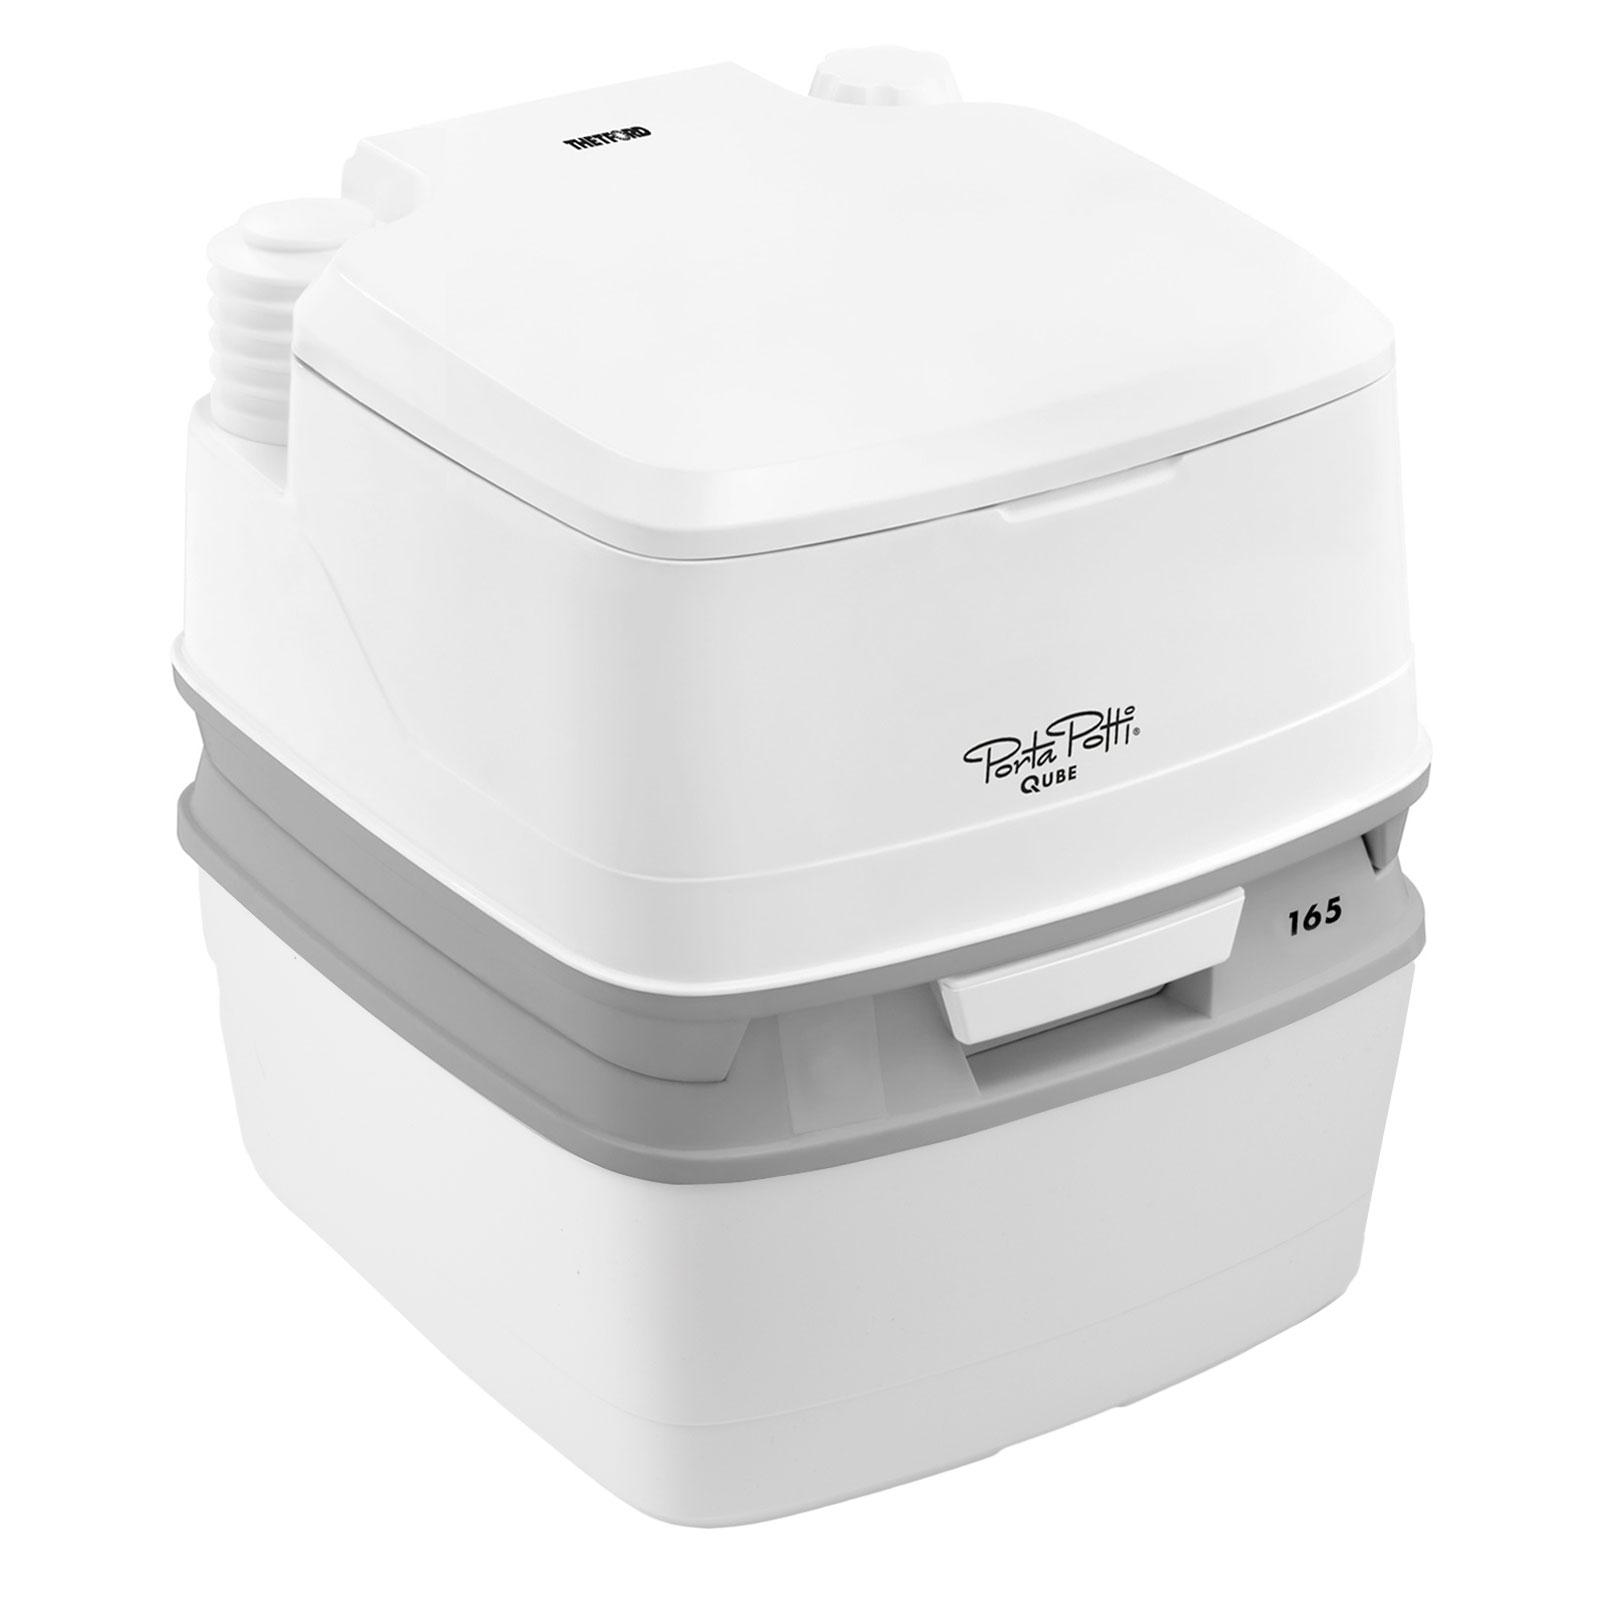 porta potti qube 165 camping 21ltr toilet paper chemie for caravan ebay. Black Bedroom Furniture Sets. Home Design Ideas